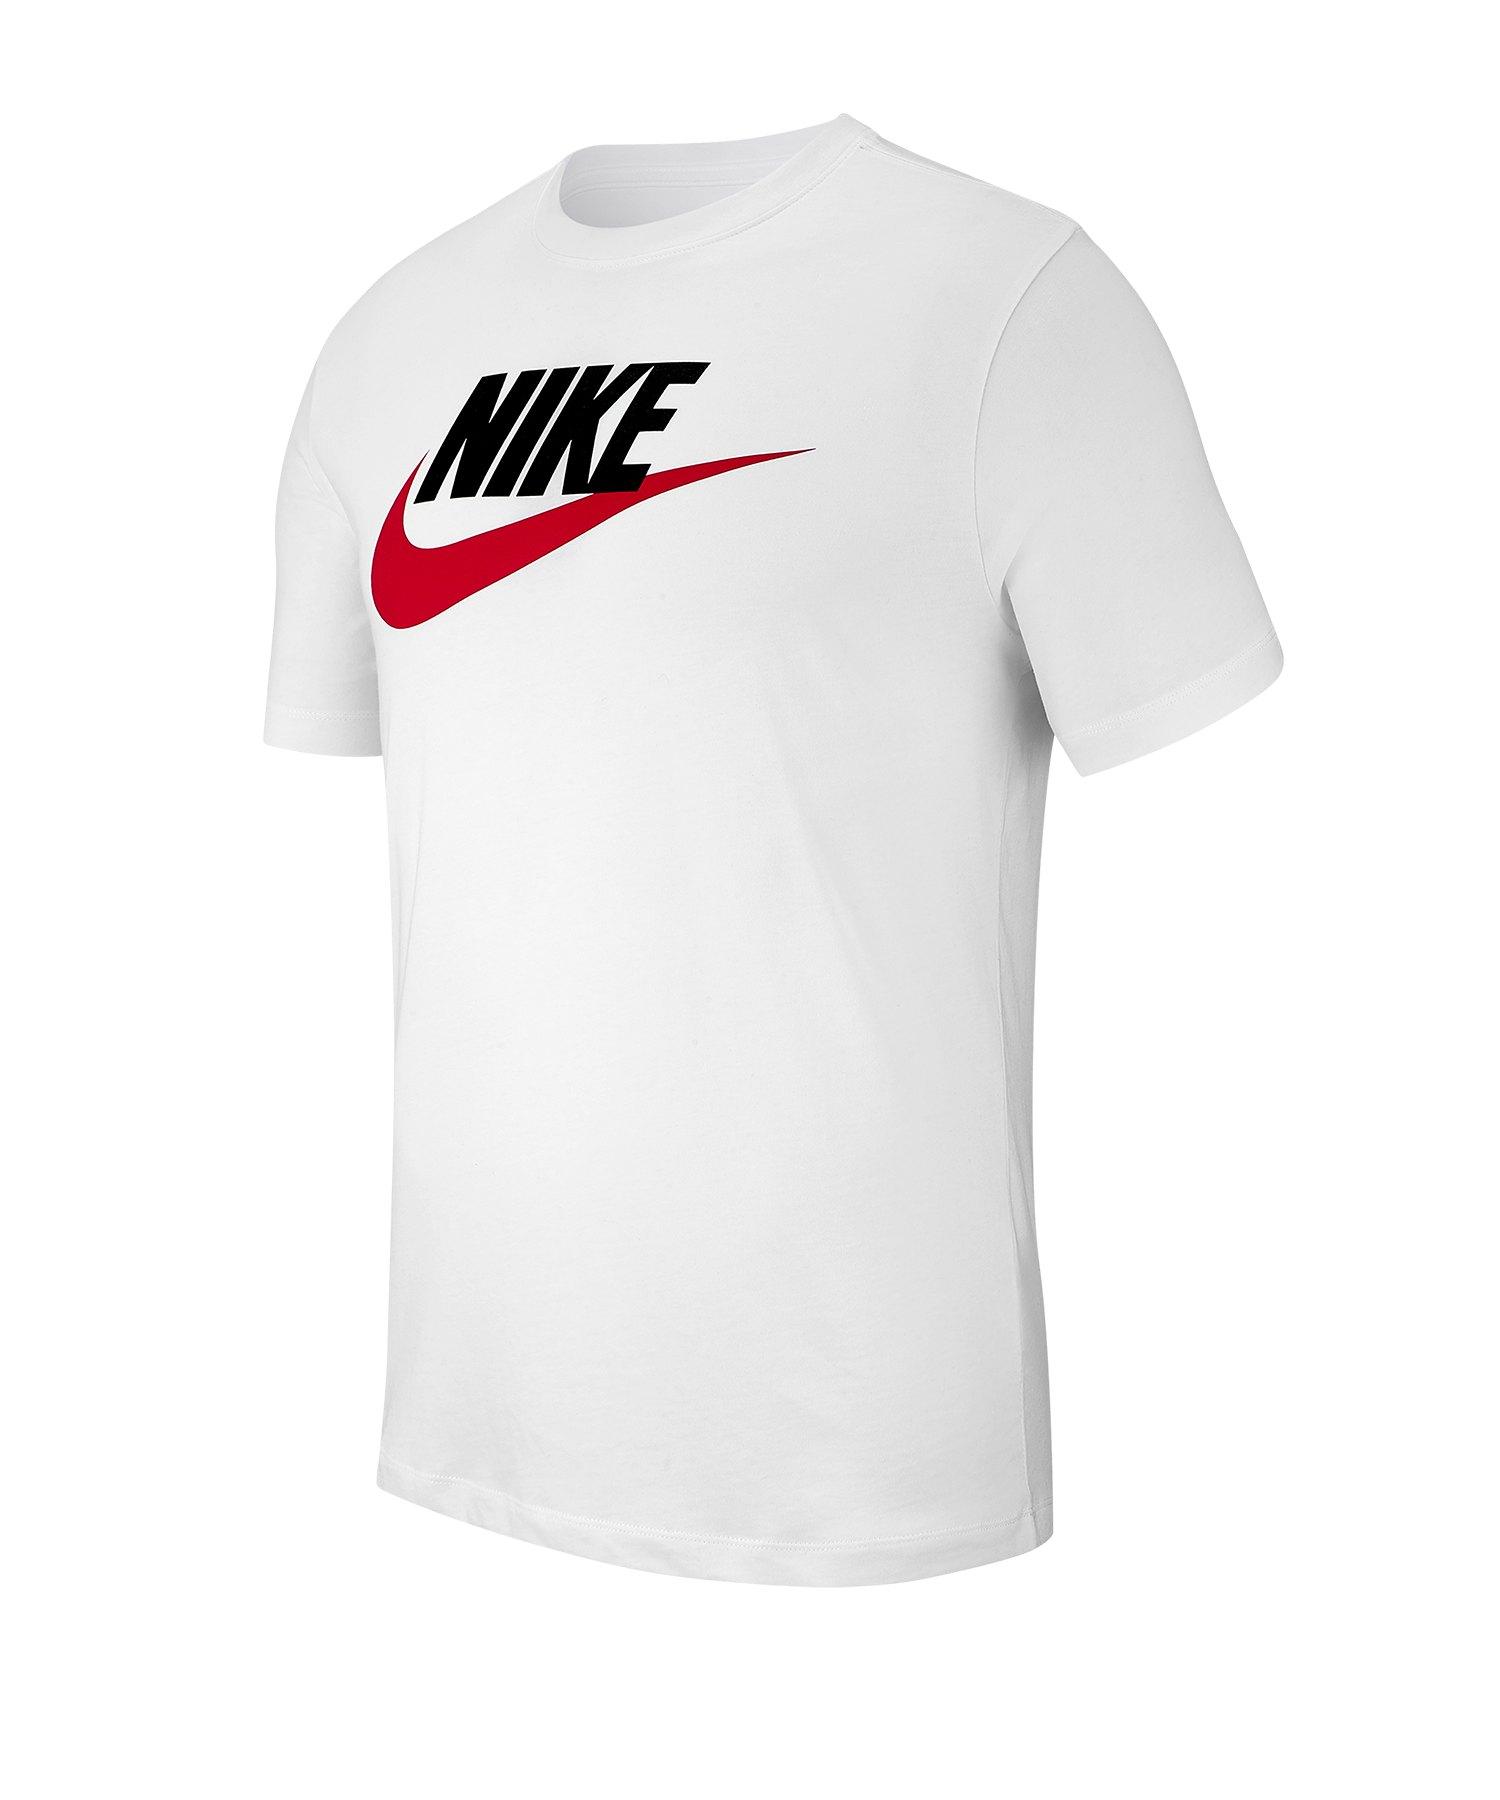 Nike Futura T-Shirt Weiss Schwarz Rot F100 - Weiss